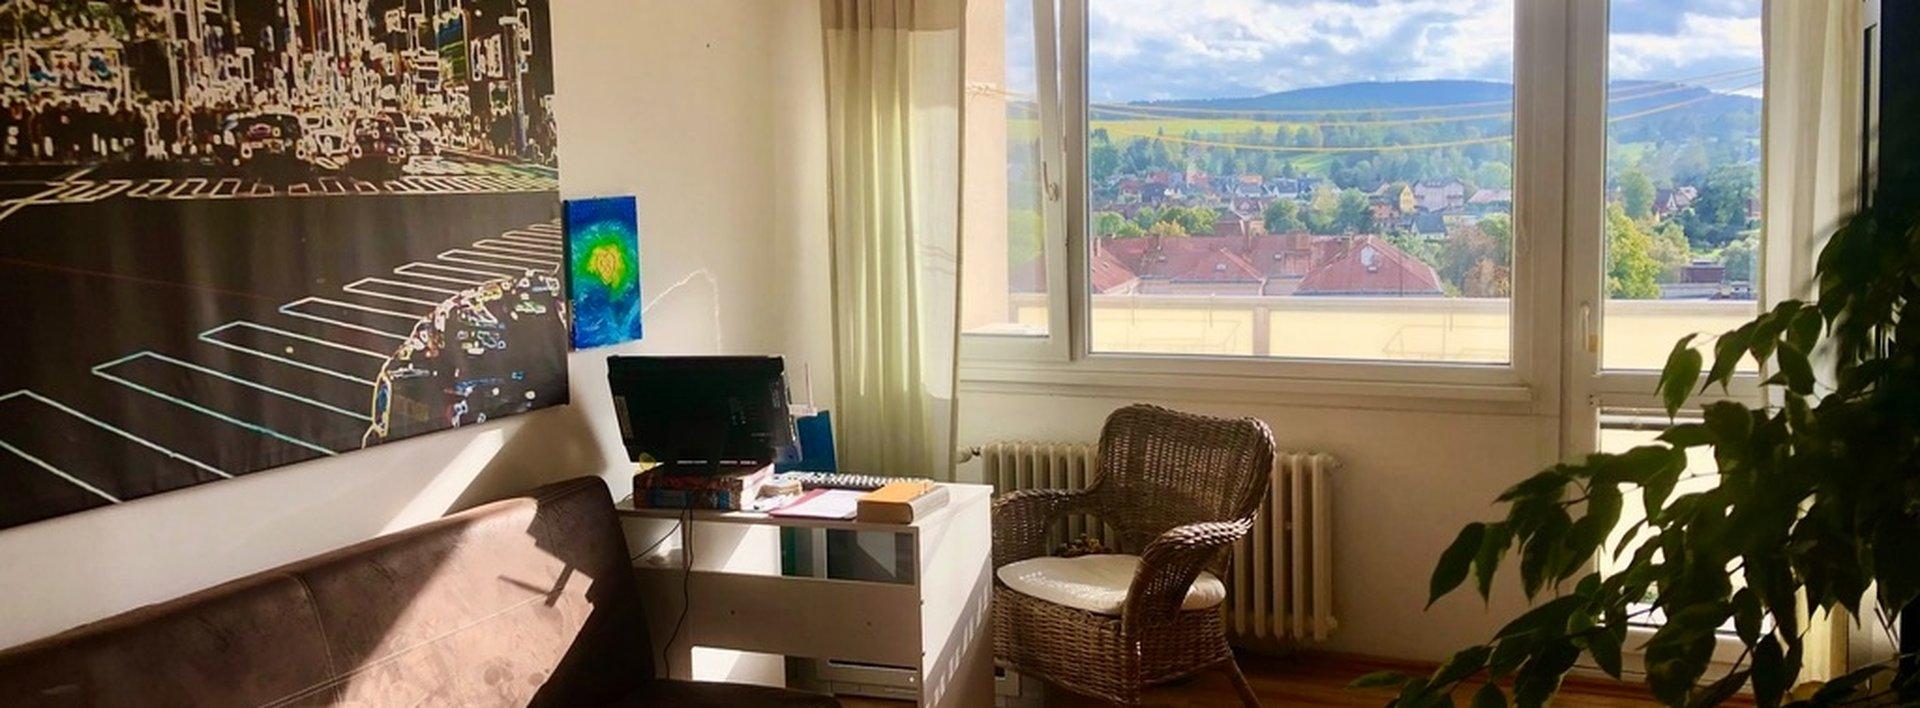 Prodej bytu 4+1, 85 m² - Liberec, Vratislavice n/N., ul. Vnitřní, Ev.č.: N49087